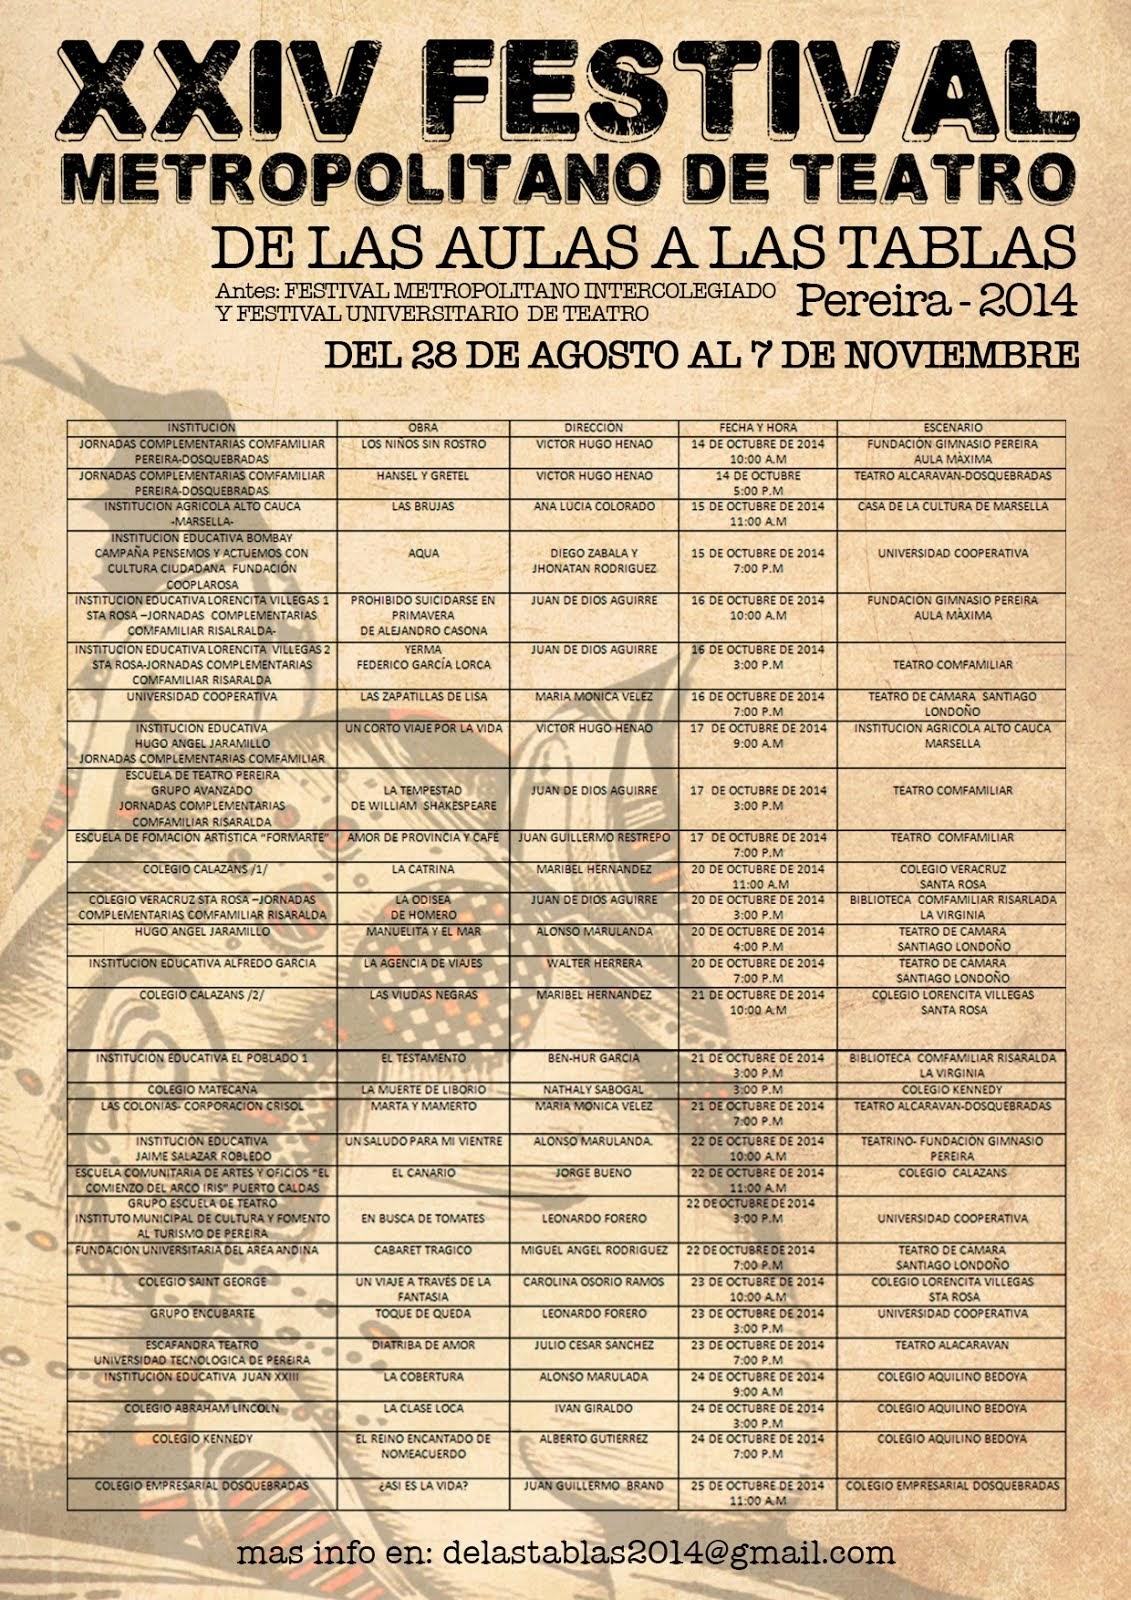 XXIV Festival Metropolitano De Teatro, De las aulas a las tablas 2014